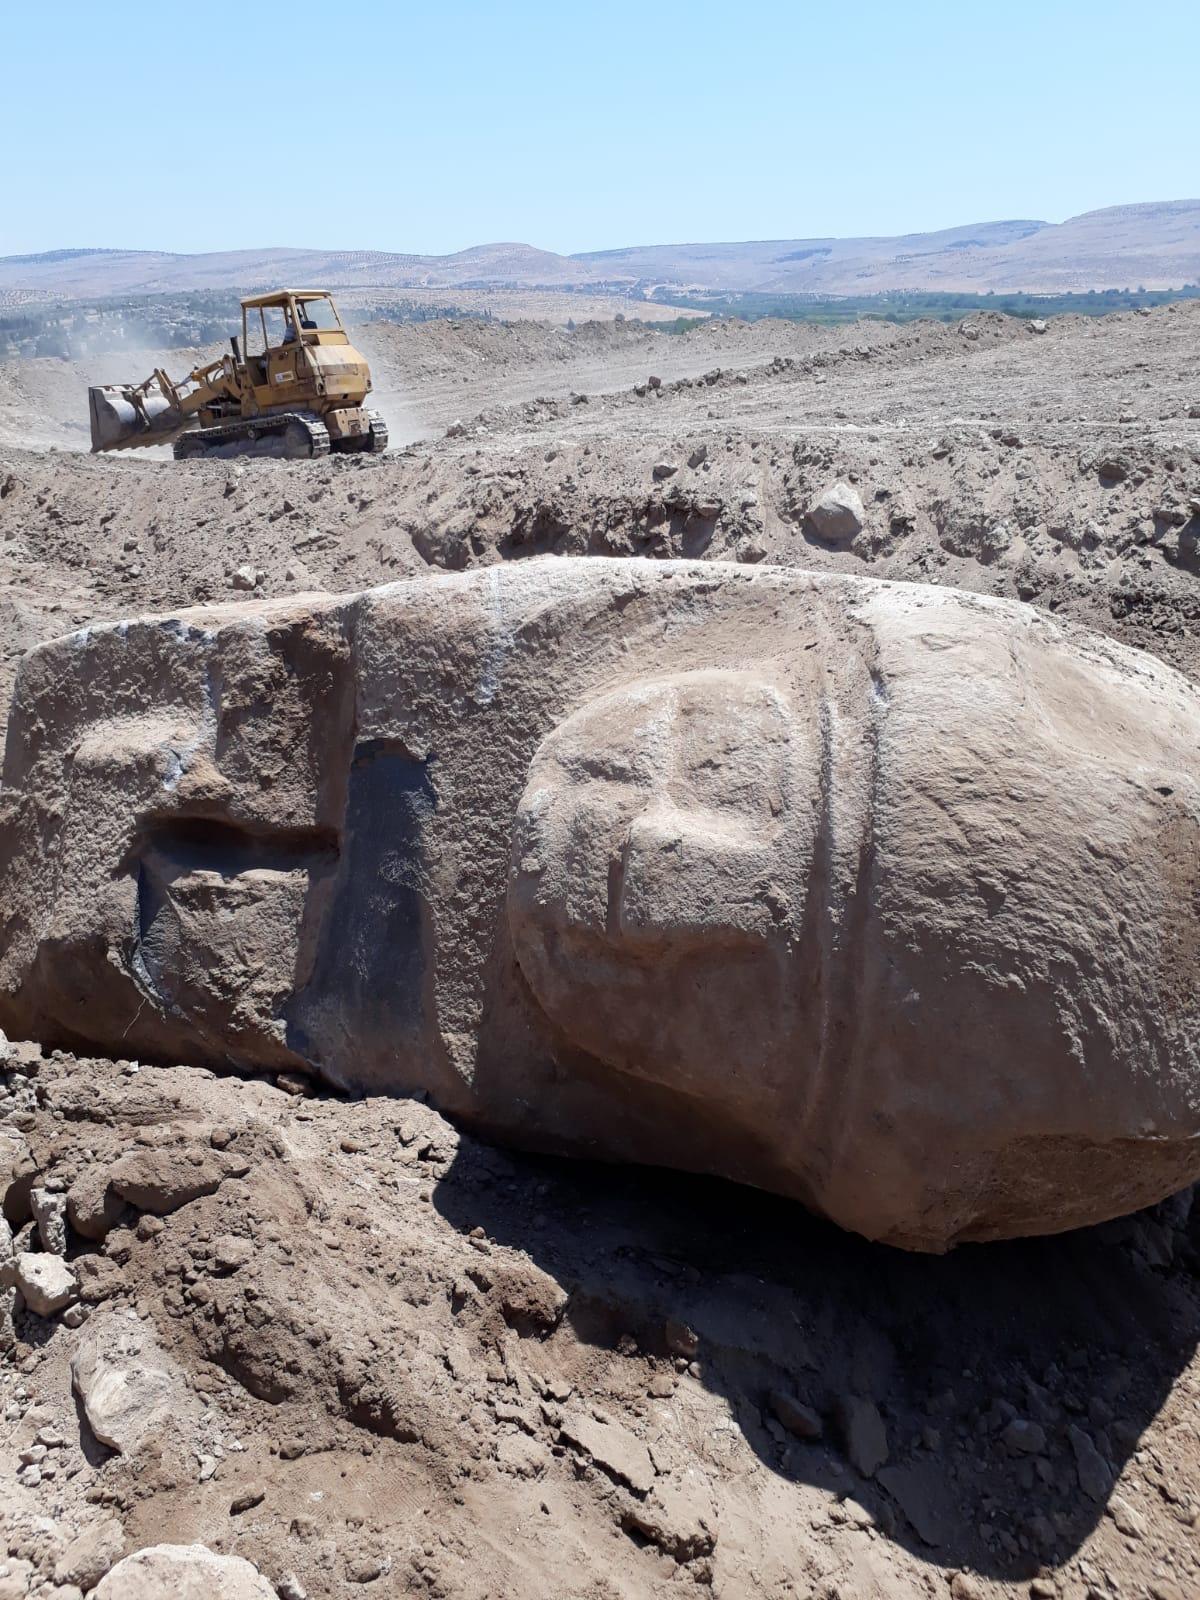 Photo of قوات الاحتلال التركي تستخدم الجرافات الثقيلة لسرقة وتدمير المواقع الأثرية في منطقة عفرين